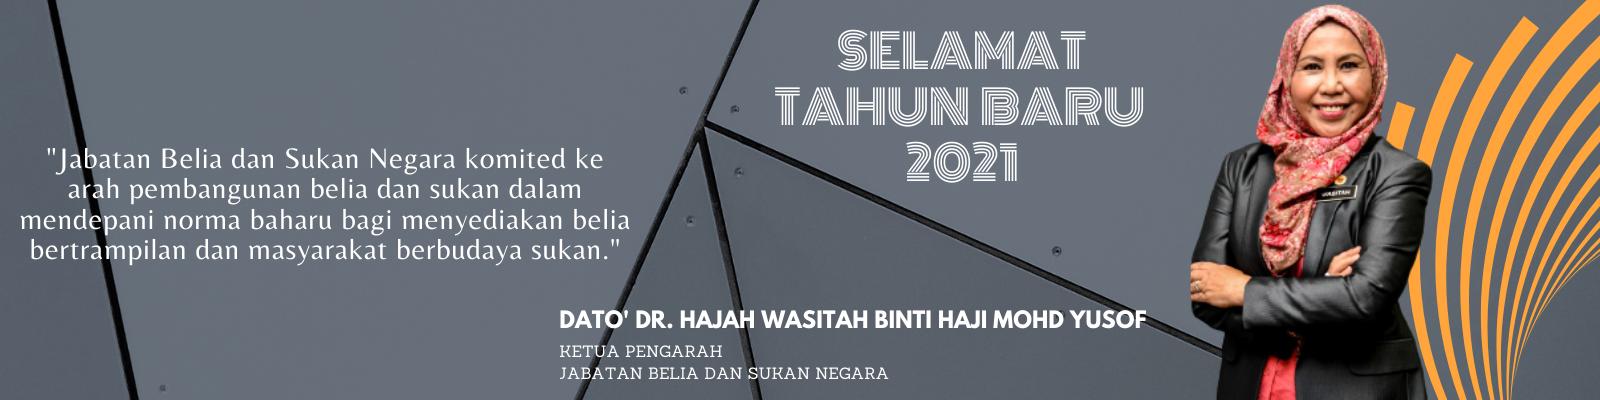 Banner_Portal_2021_Dato.png